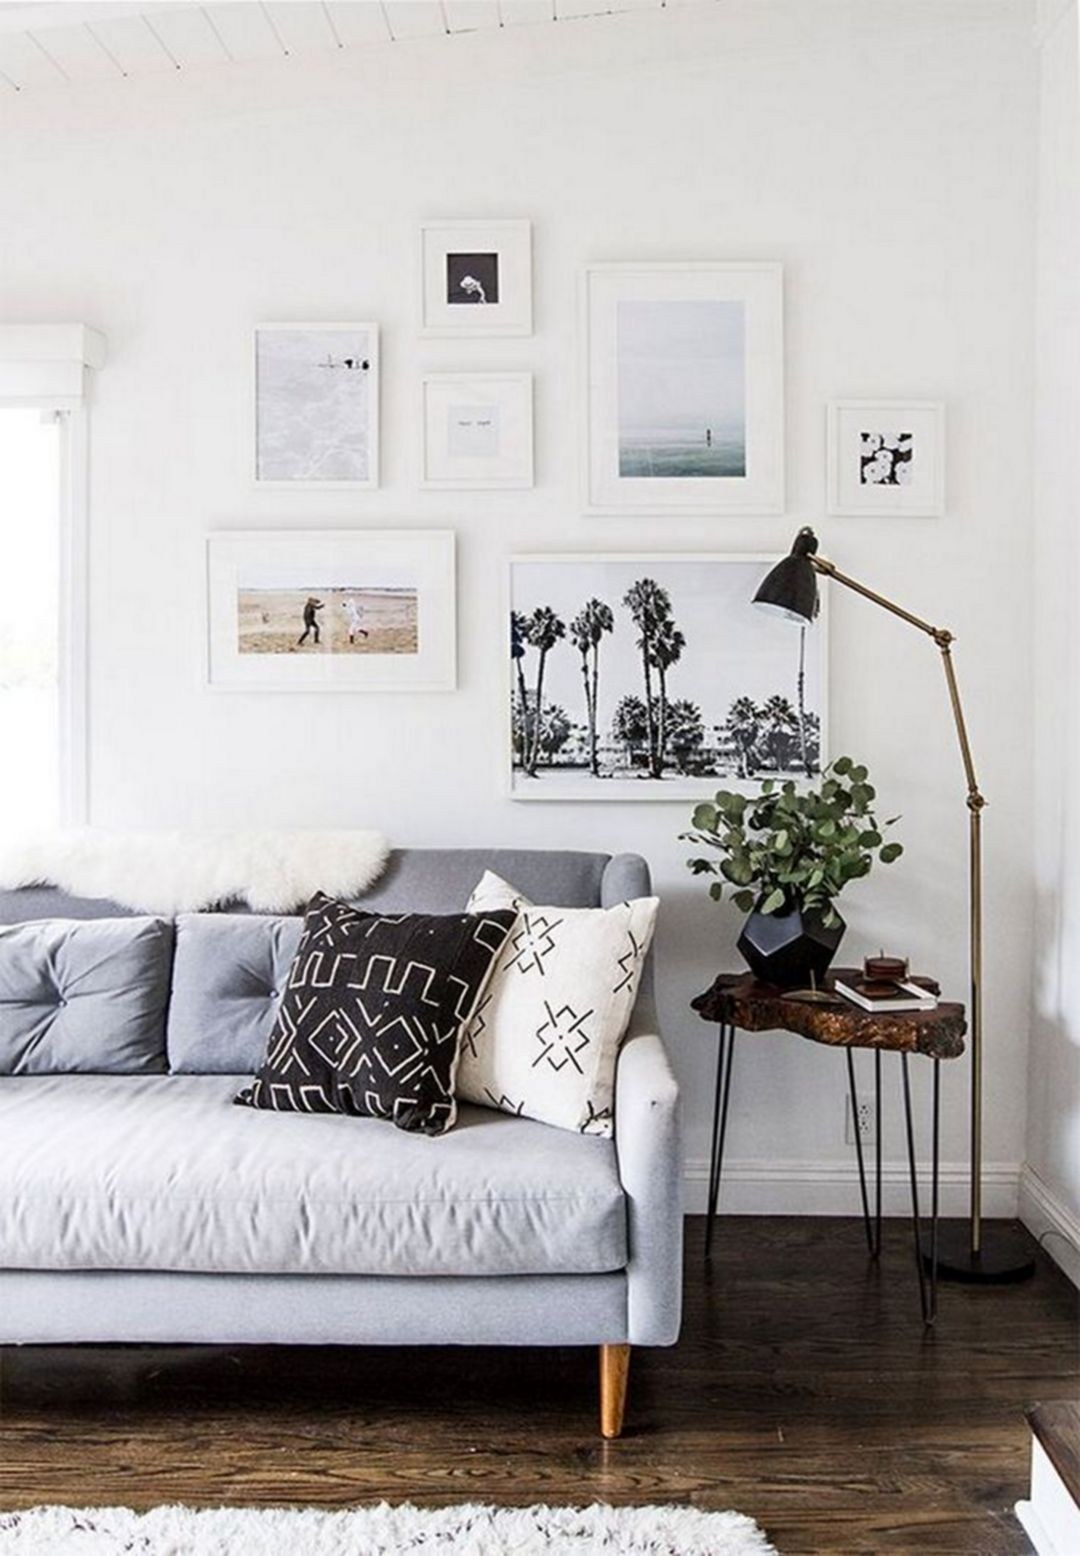 Beautiful minimalist home decor on a budget budgeting